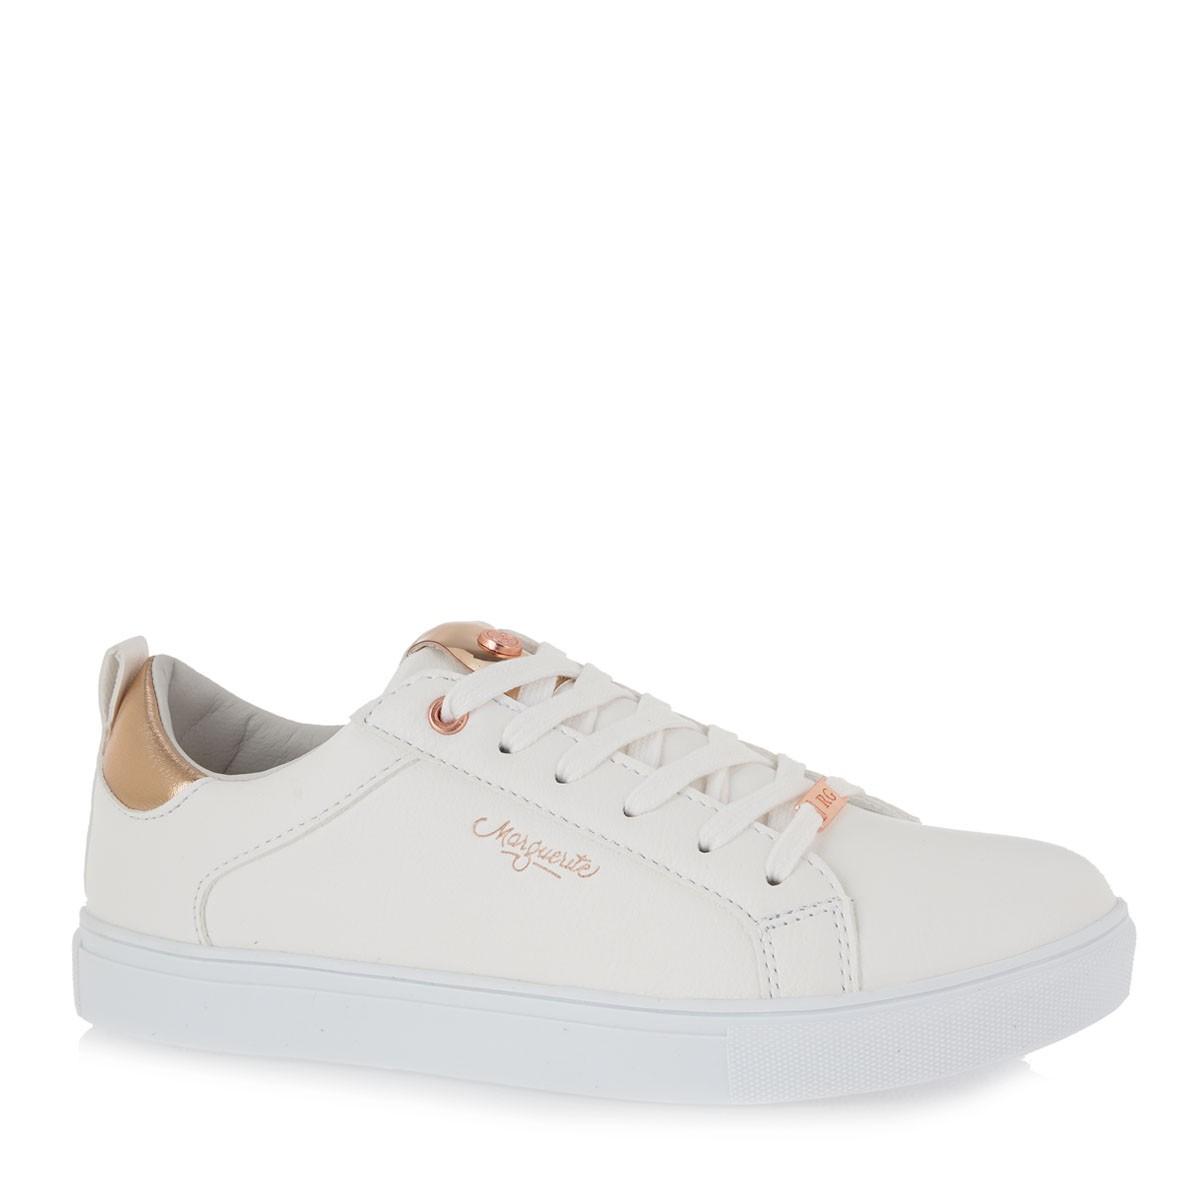 Renato Garini Sneakers Γυναικεία Παπούτσια 218-19WC1218 Λευκό Ρόζ Χρυσό K157Q218265S